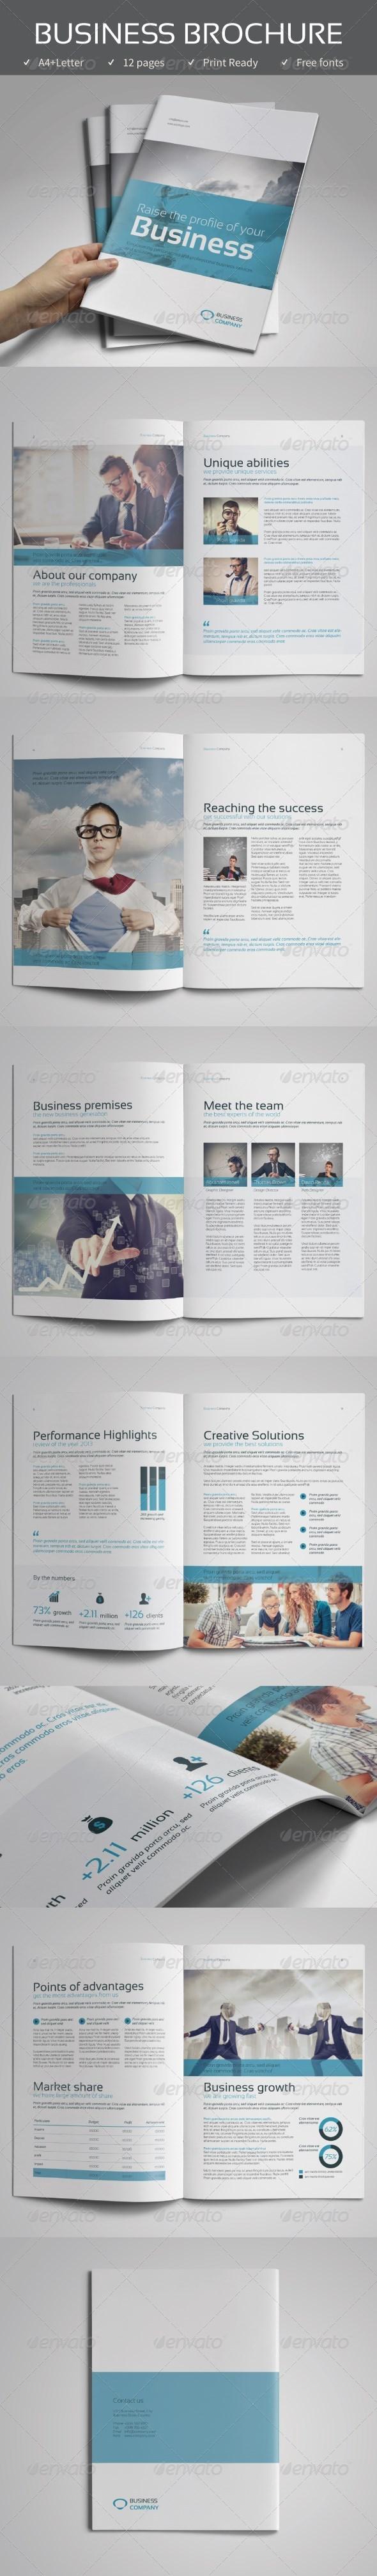 GraphicRiver Corporate Business Brochure vol.1 7805534